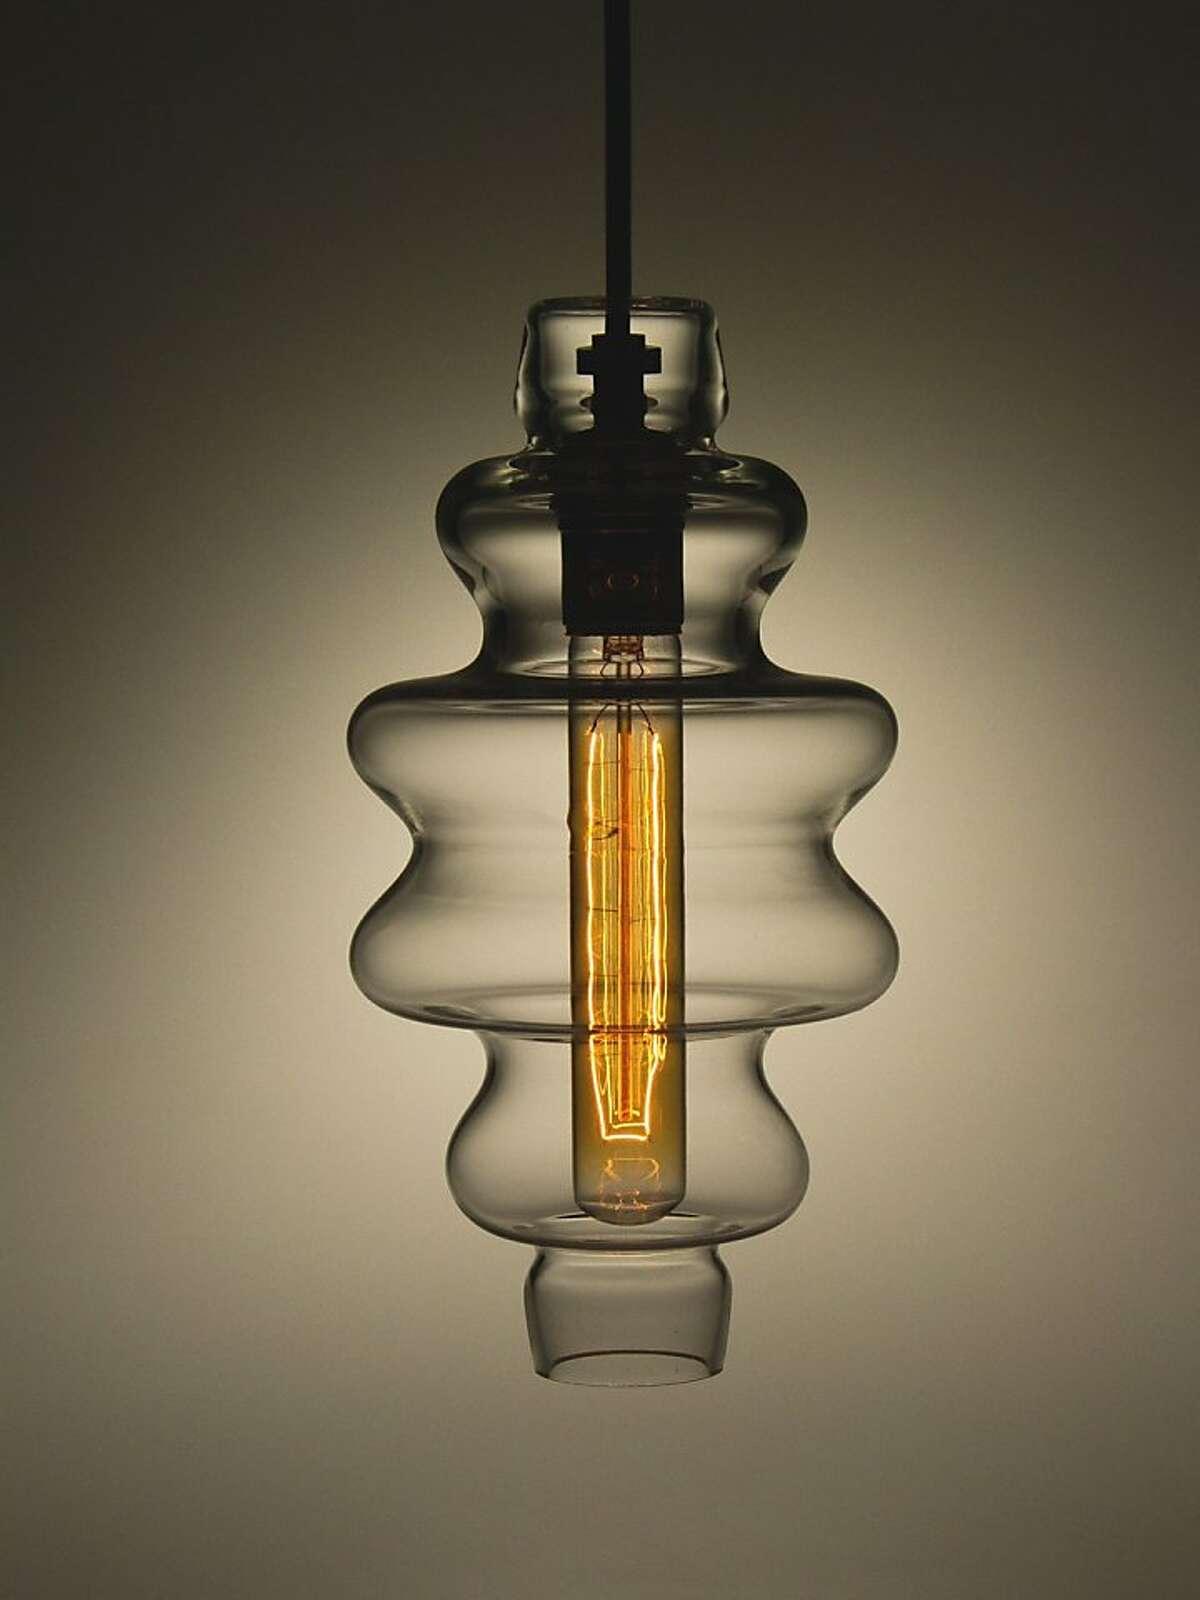 Light fixture from Union Street Glass.